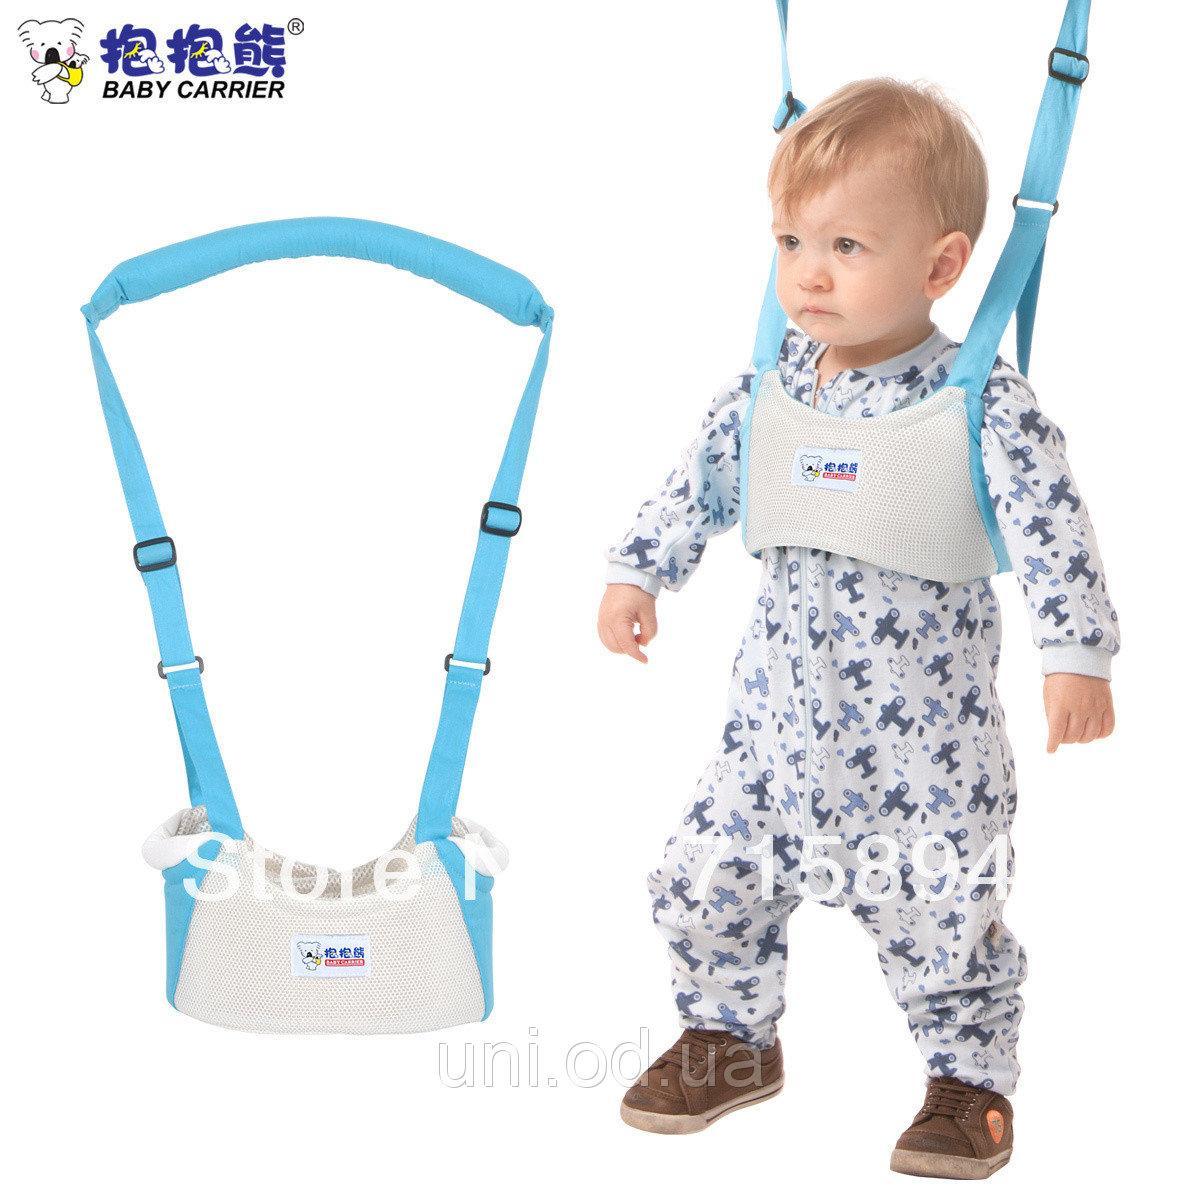 Zhengyuebaobao Moon Walk Basket Type Toddler Baby Belt